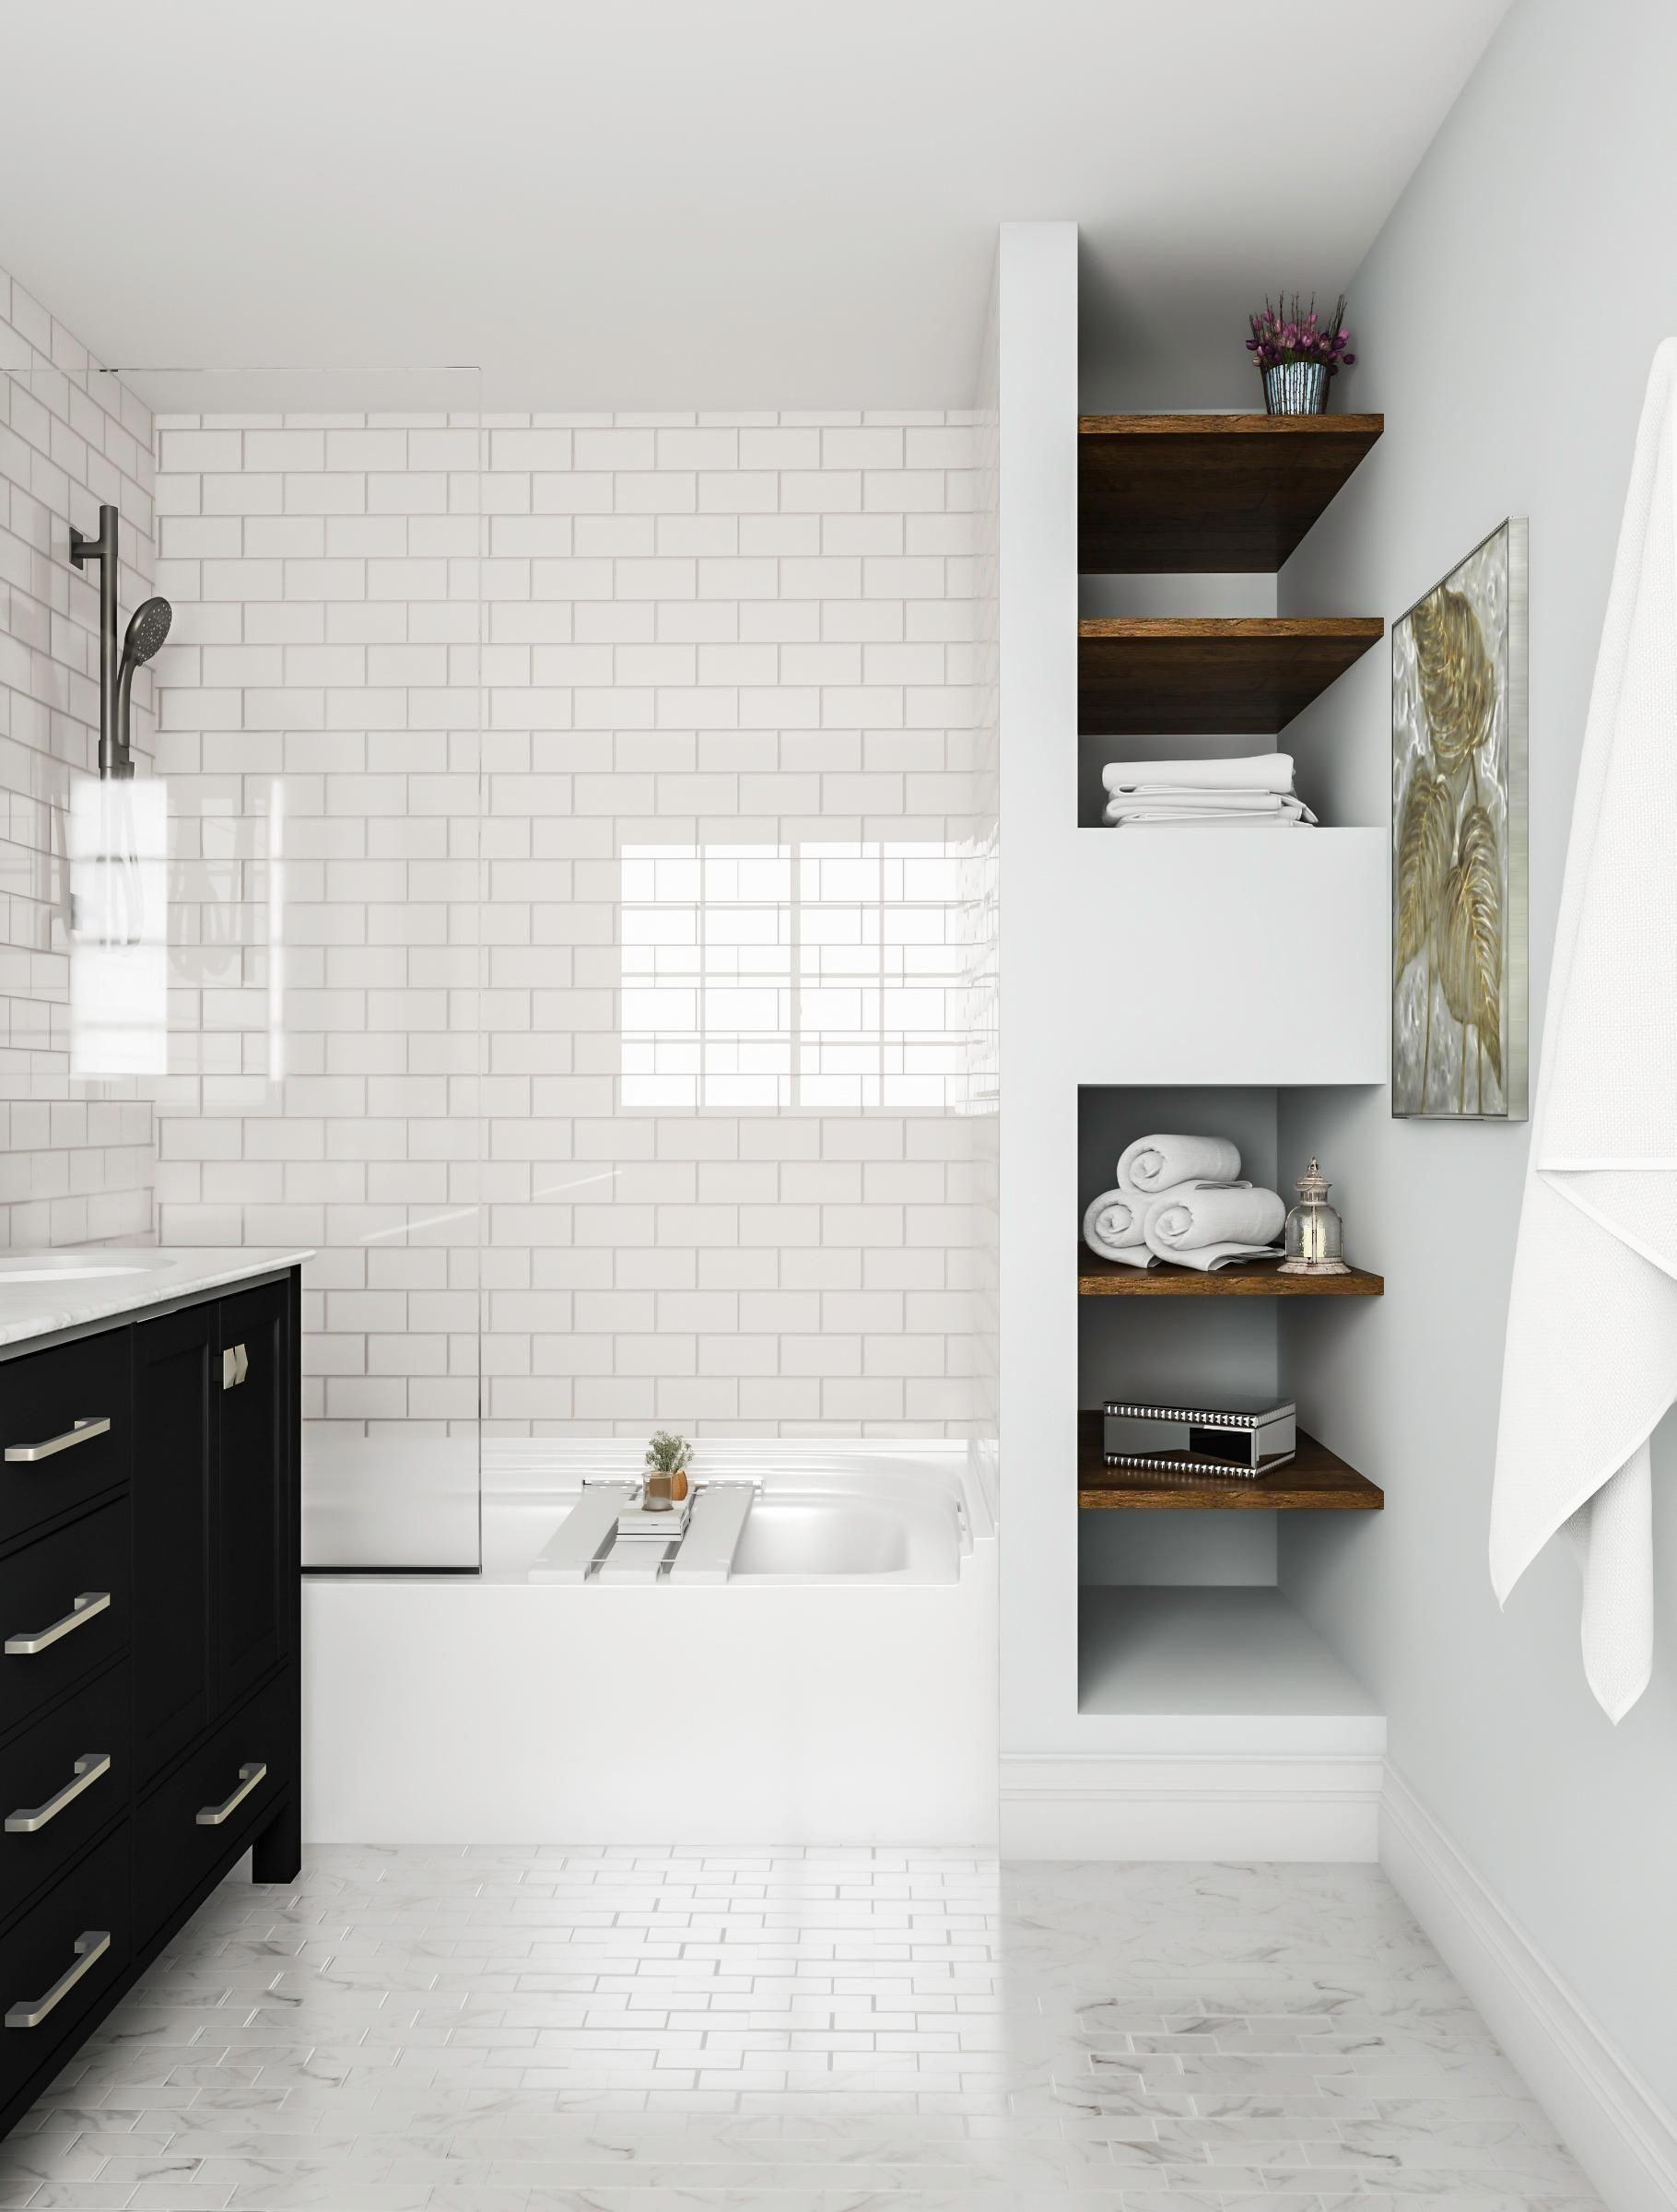 Cute Bathroom Sets Bathroom Accessories Near Me Green And Brown Bathroom Set 20190123 Bathrooms Remodel Trendy Bathroom Small Bathroom